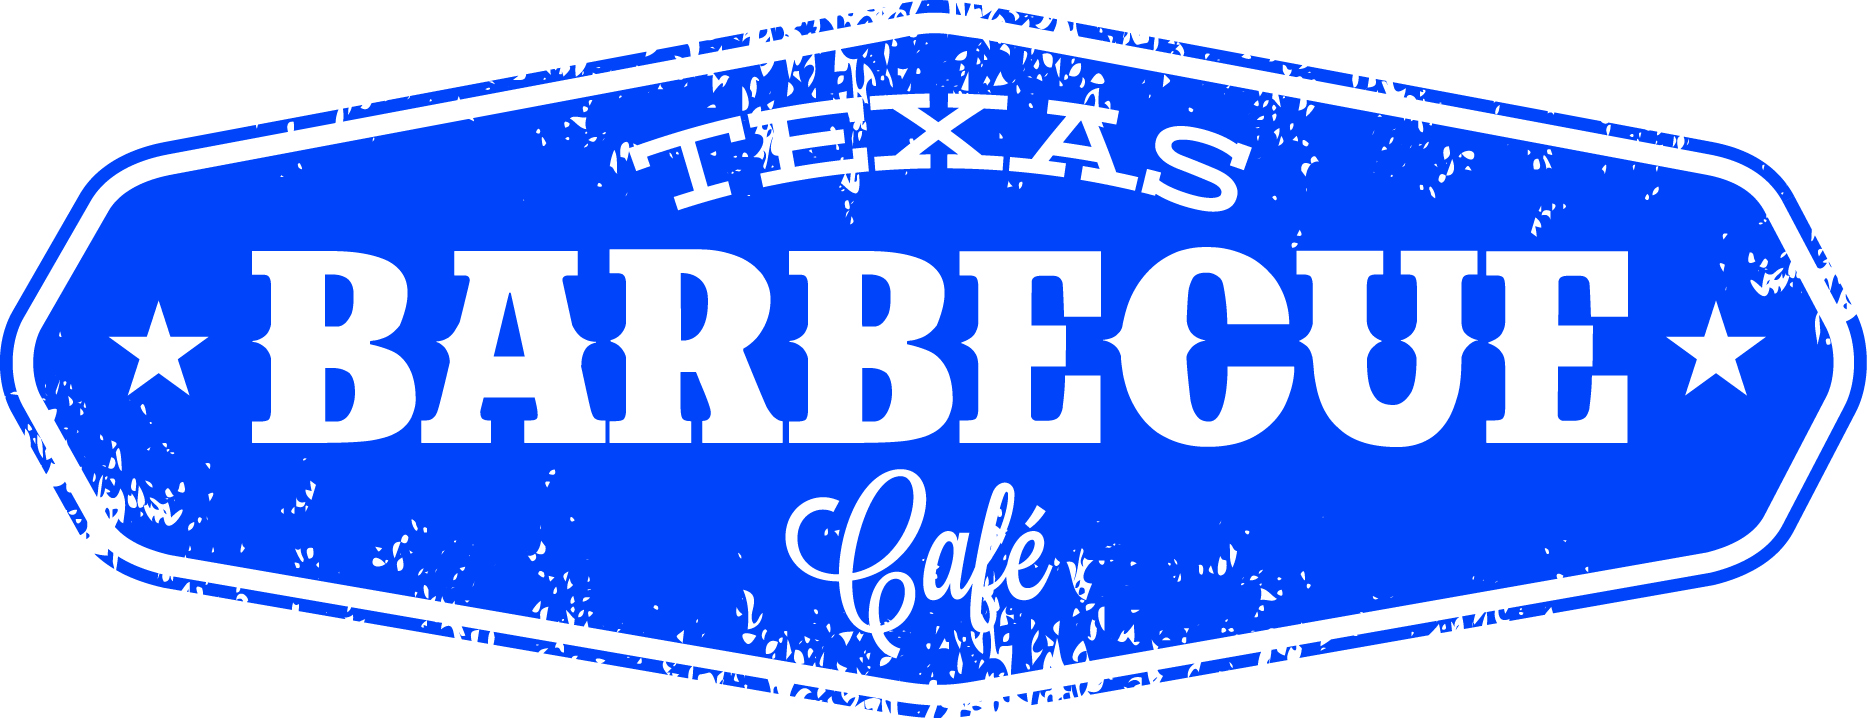 TexasBarbecue